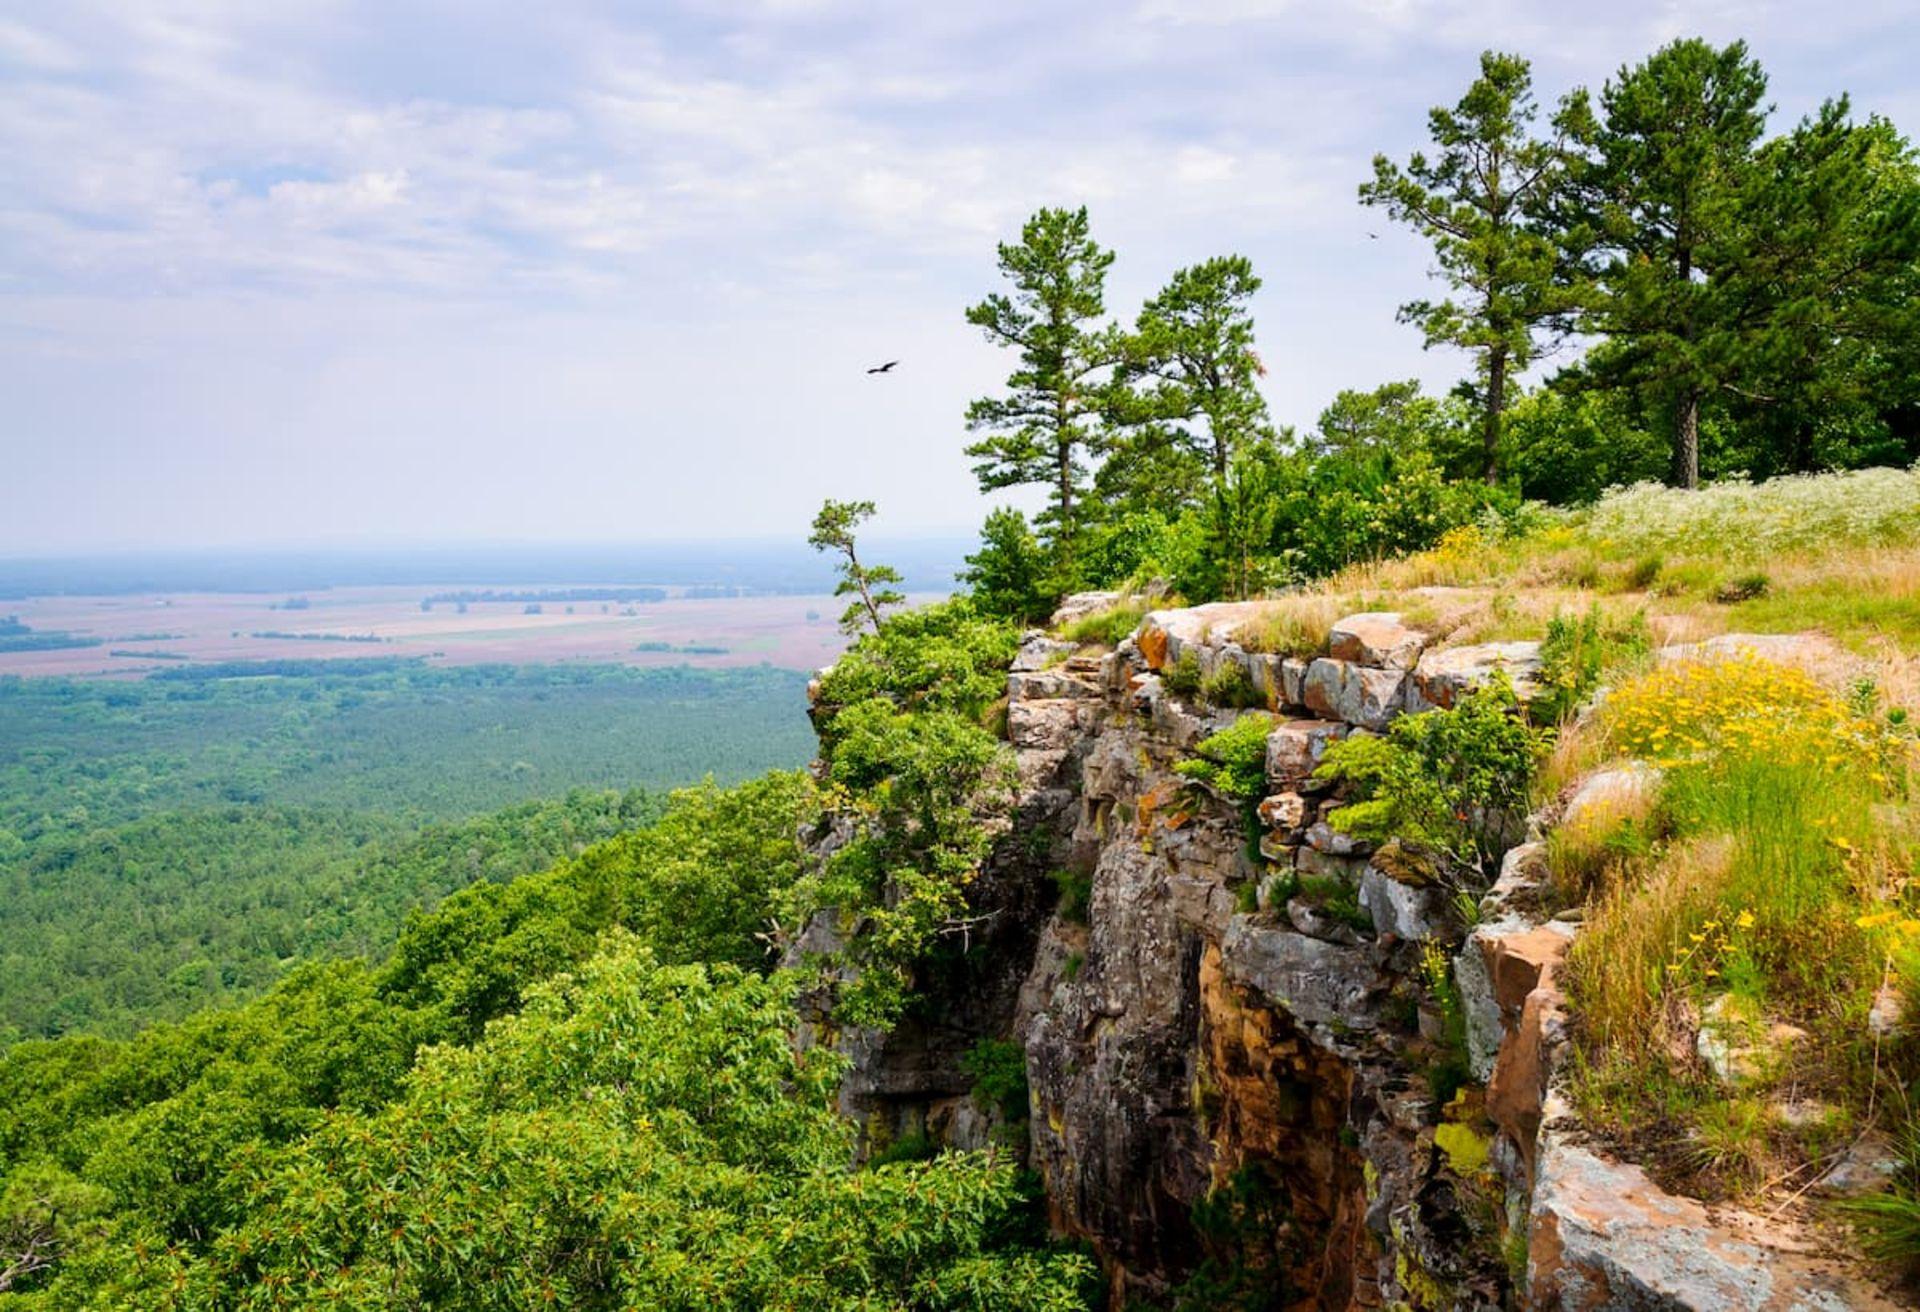 Enjoy a Vibrant Arkansas Lifestyle At Holiday Island in the Ozarks!